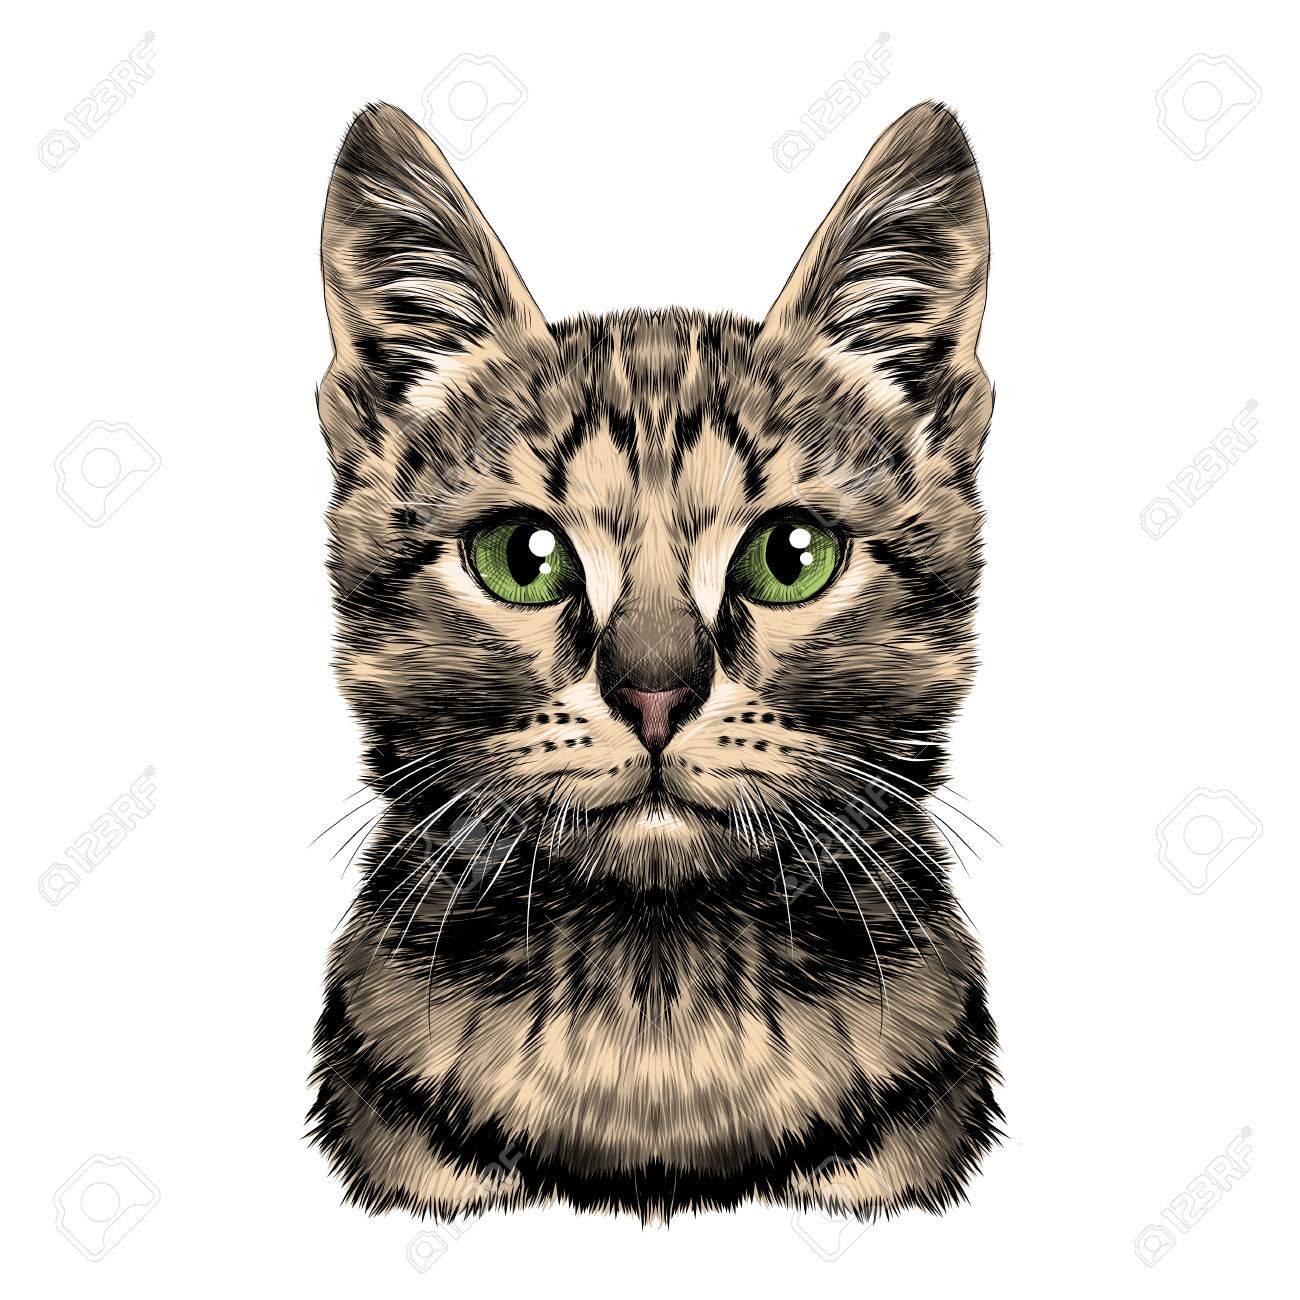 Gato Manchado Rayado Cabeza Simétrica Dibujo Vector Gráficos Color